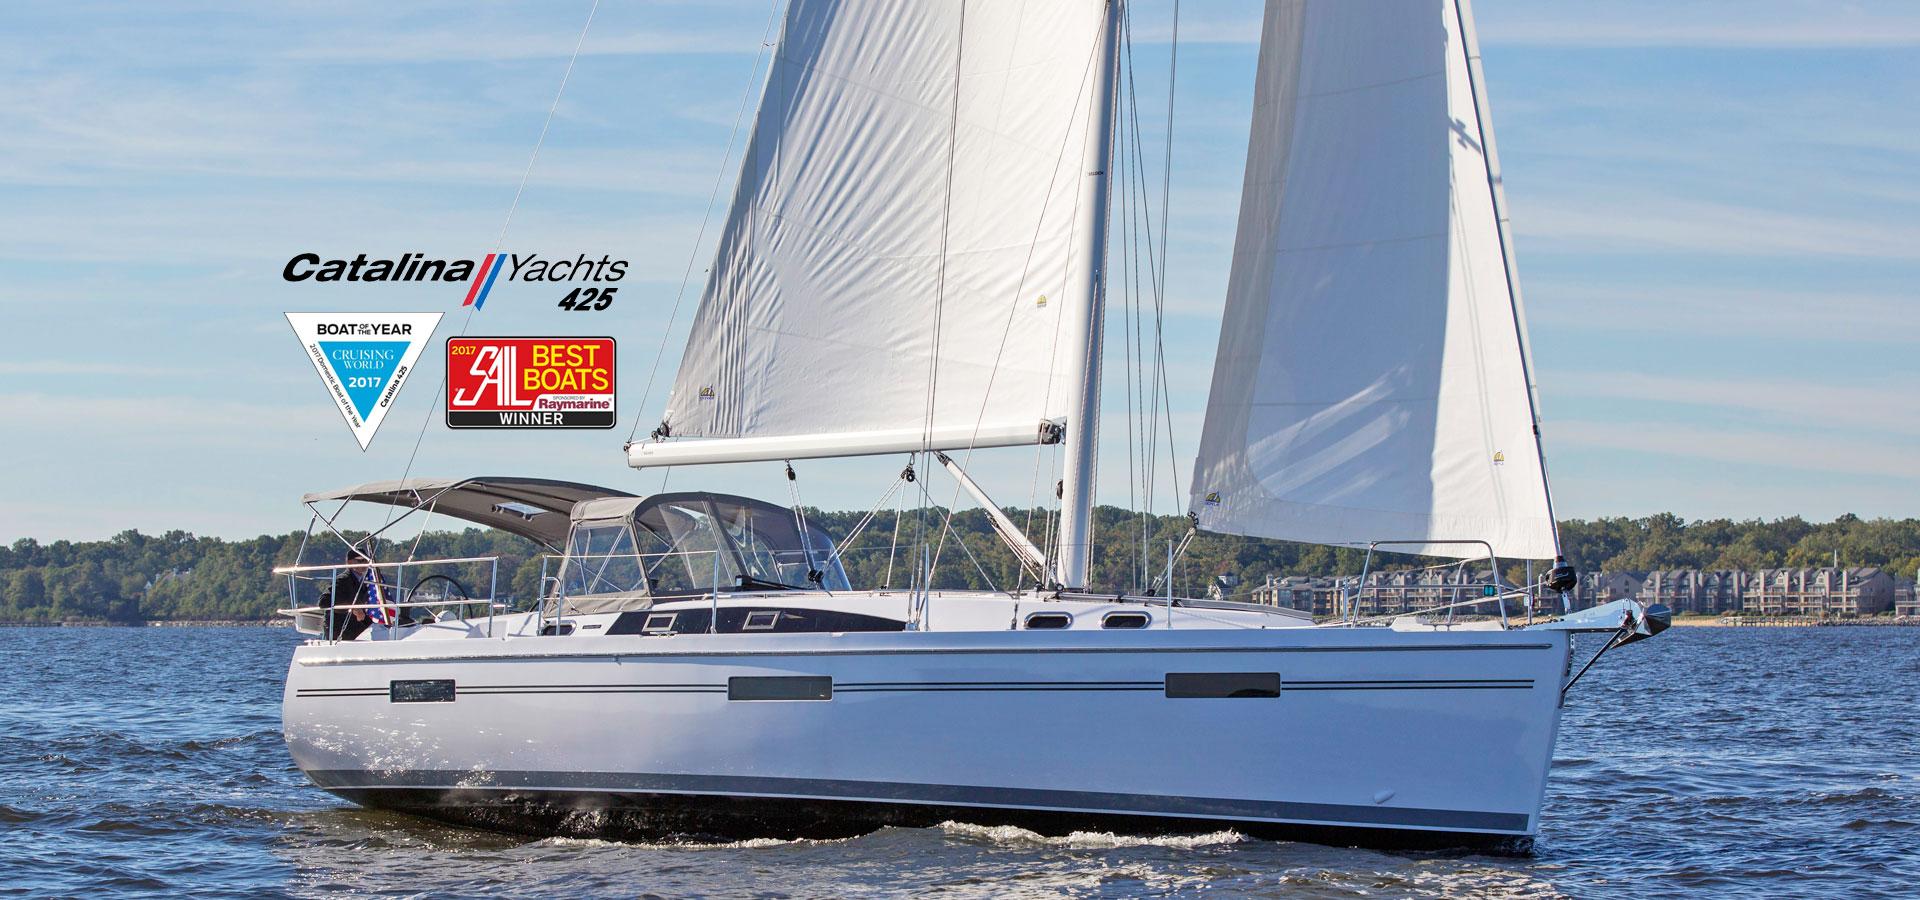 hight resolution of catalina 425 sailing cruising world 2017 boat of the year sail magazine 2017 best